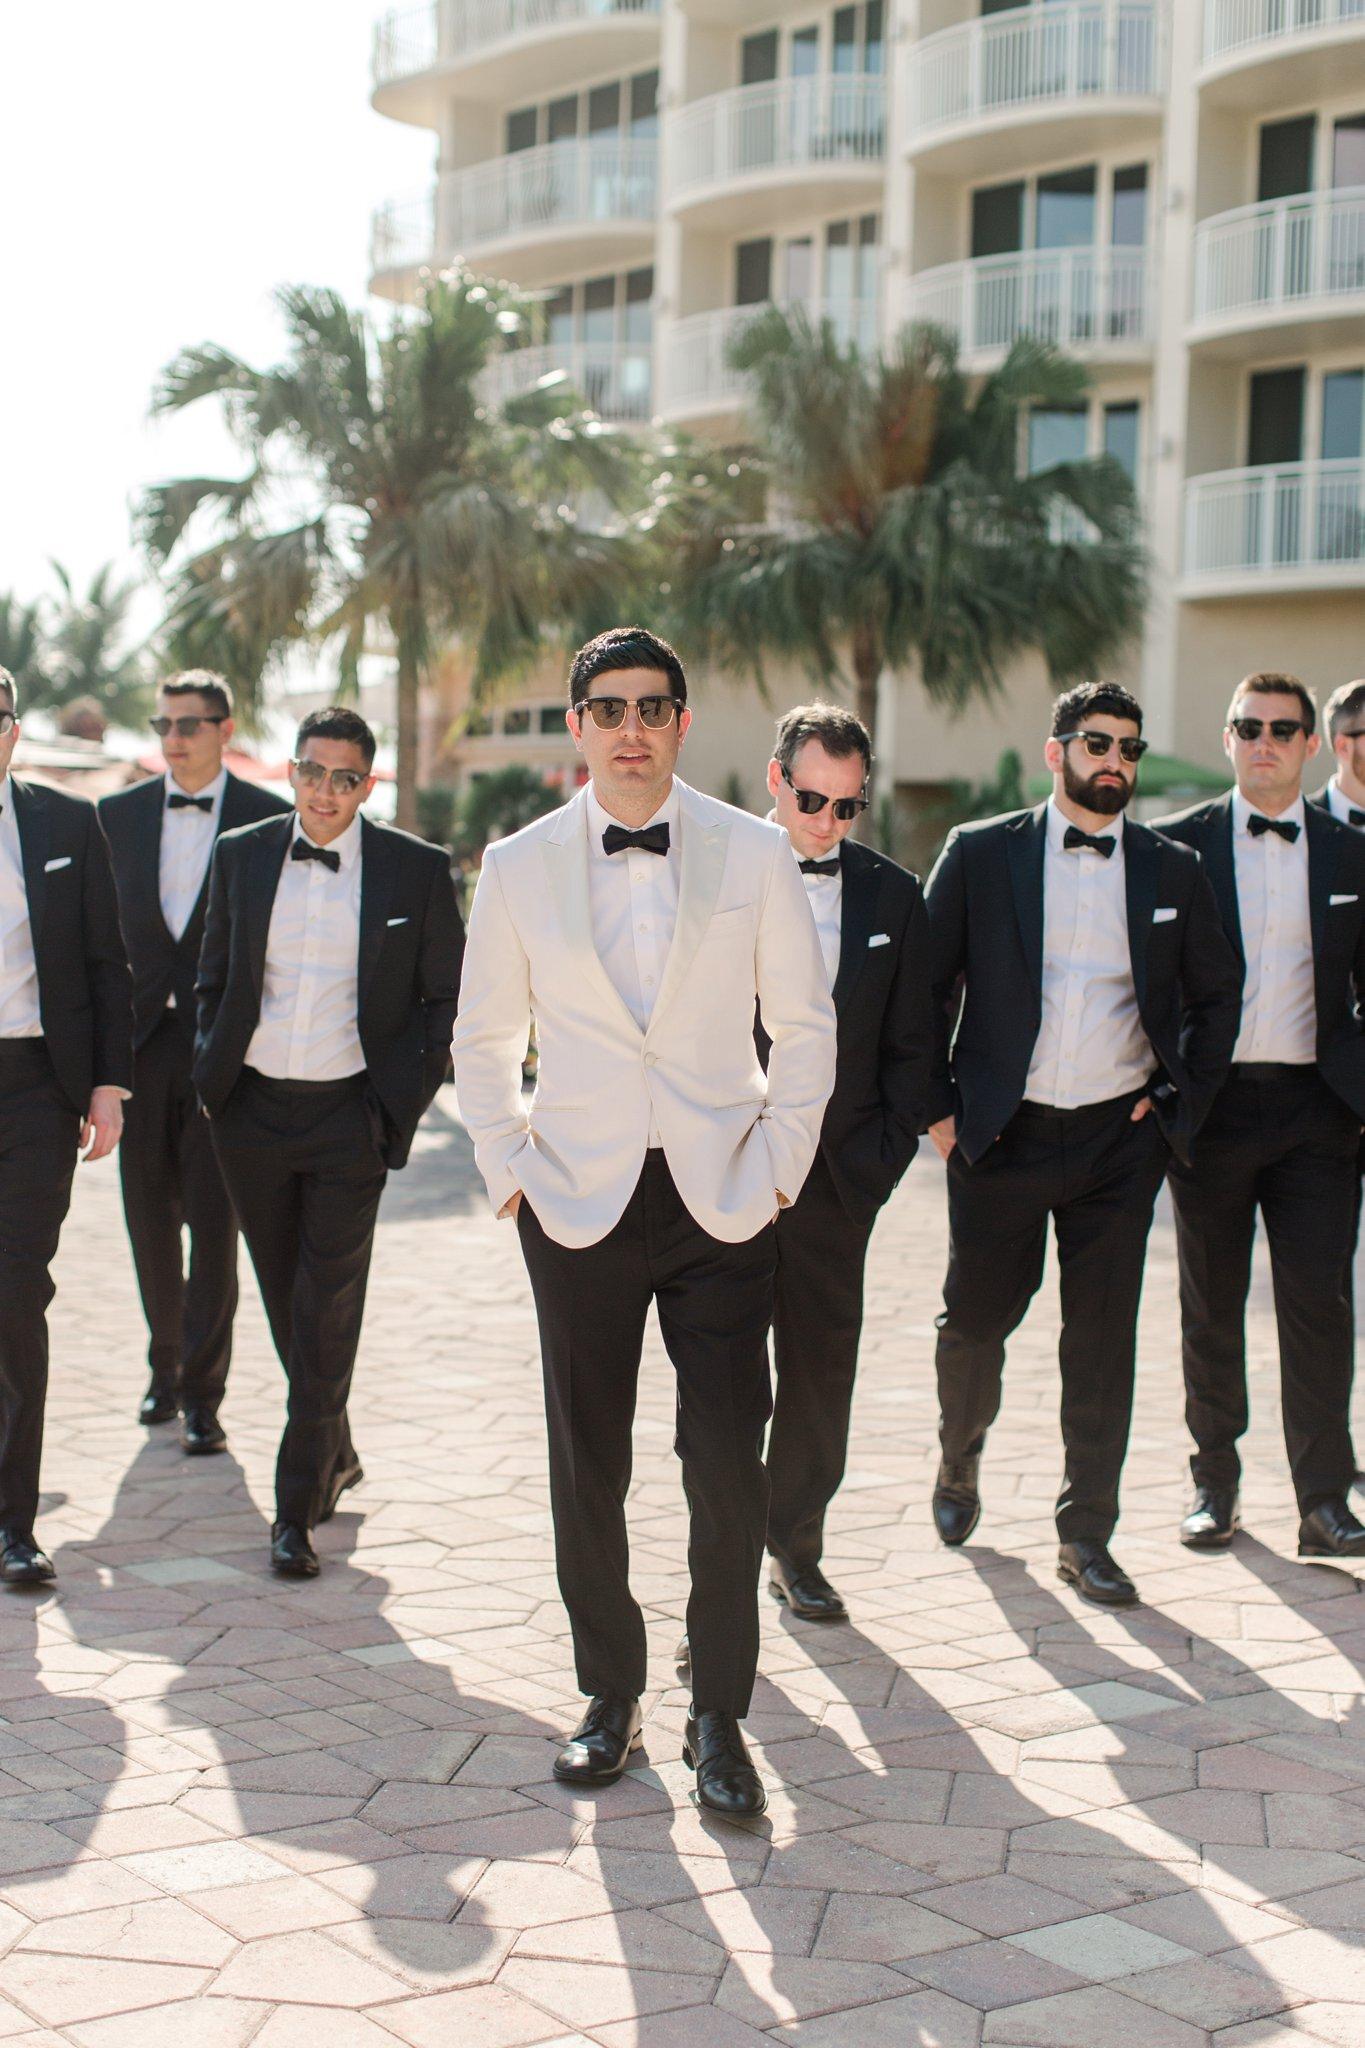 jw marriott marco island wedding photographer marco island wedding photographer shannon griffin photography_0138.jpg